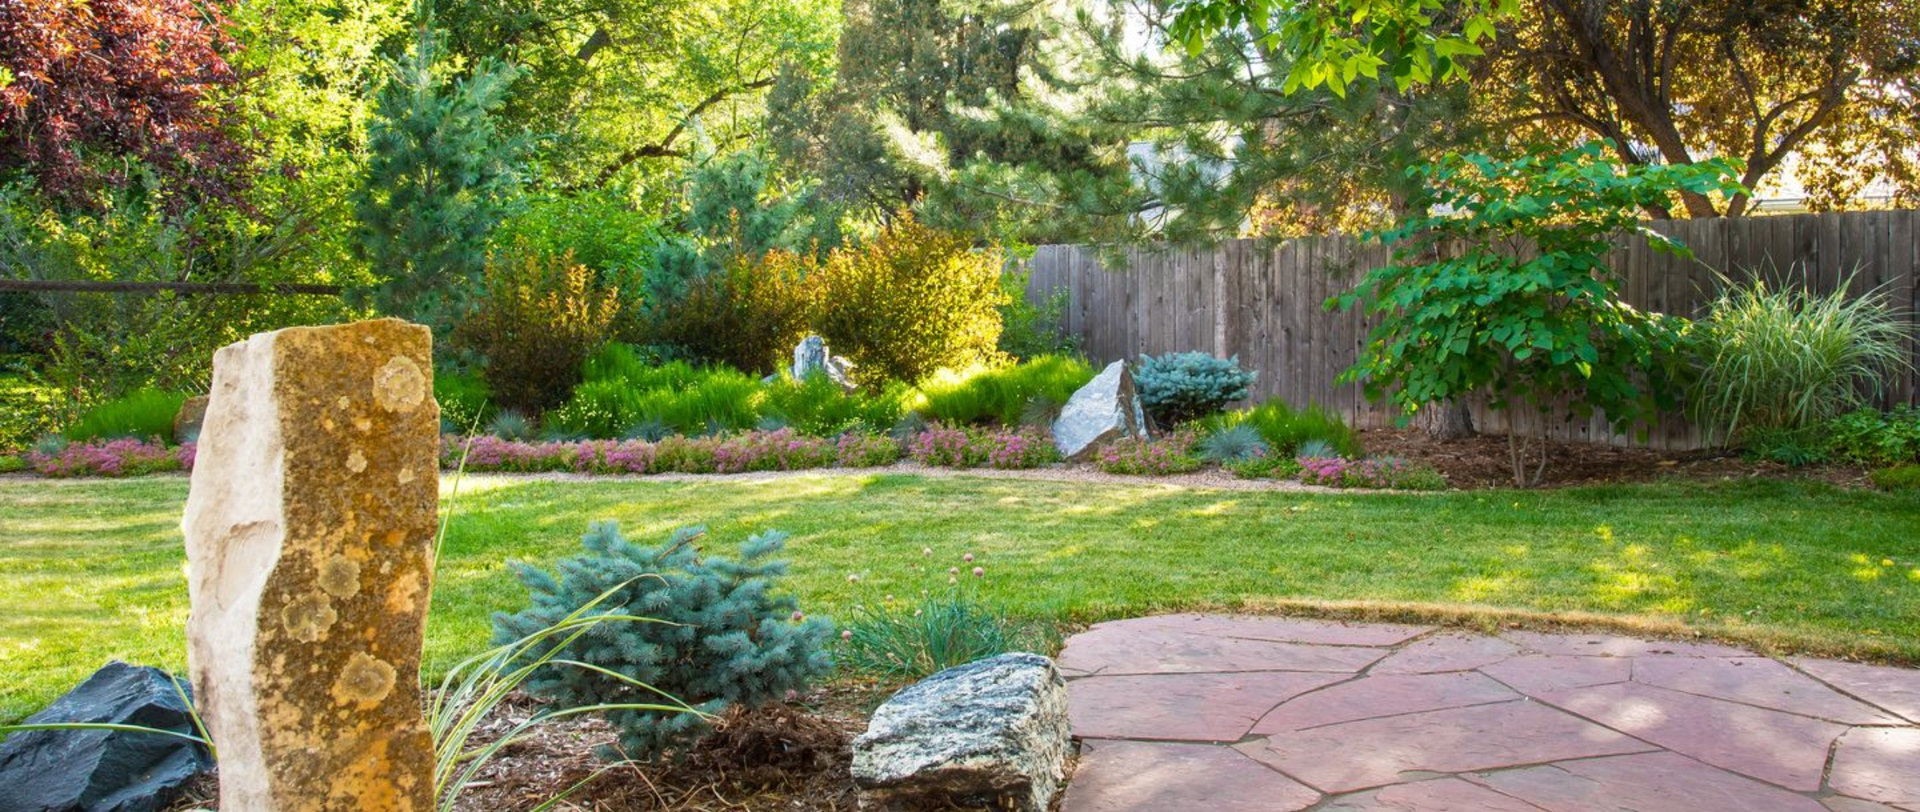 Backyard-wide-view-cropped-1440-pix-wide